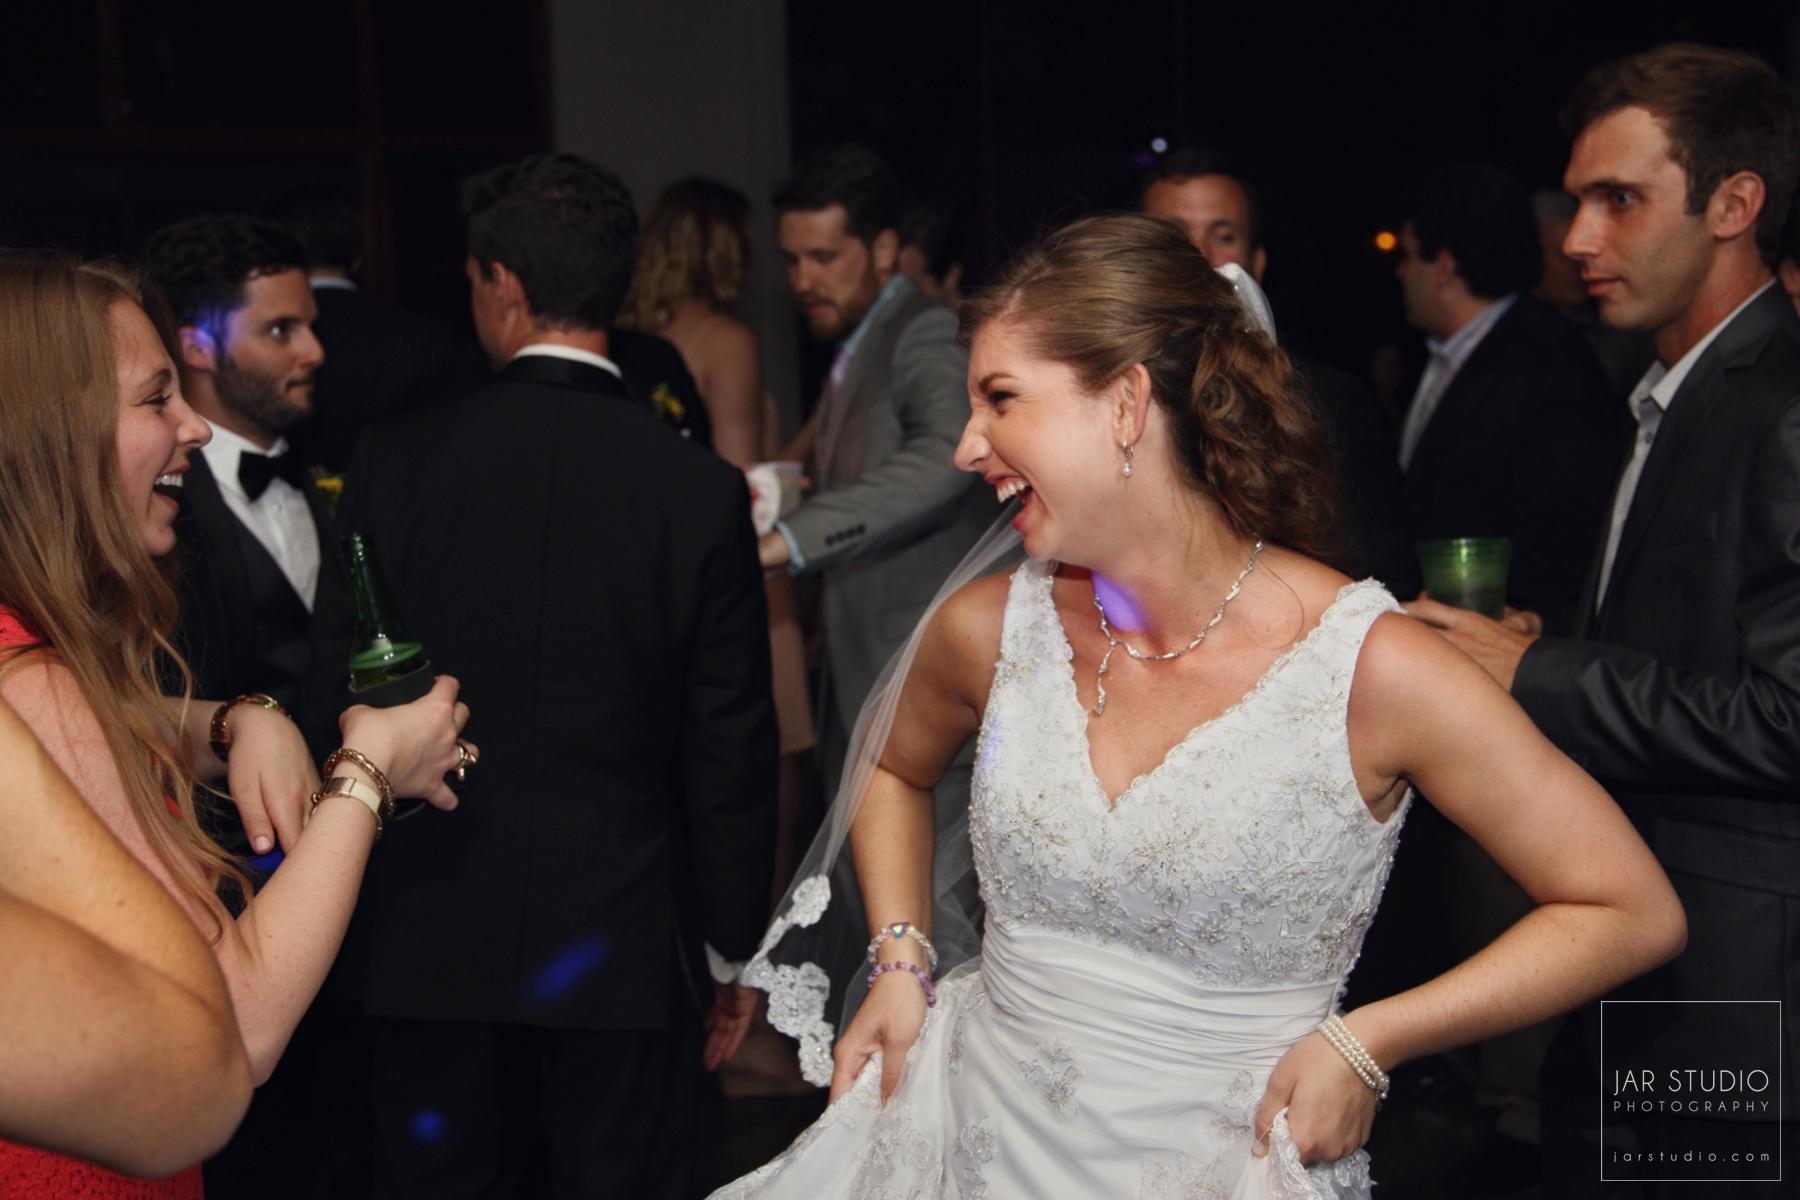 29-orlando-wedding-reception-jarstudio-photography.JPG